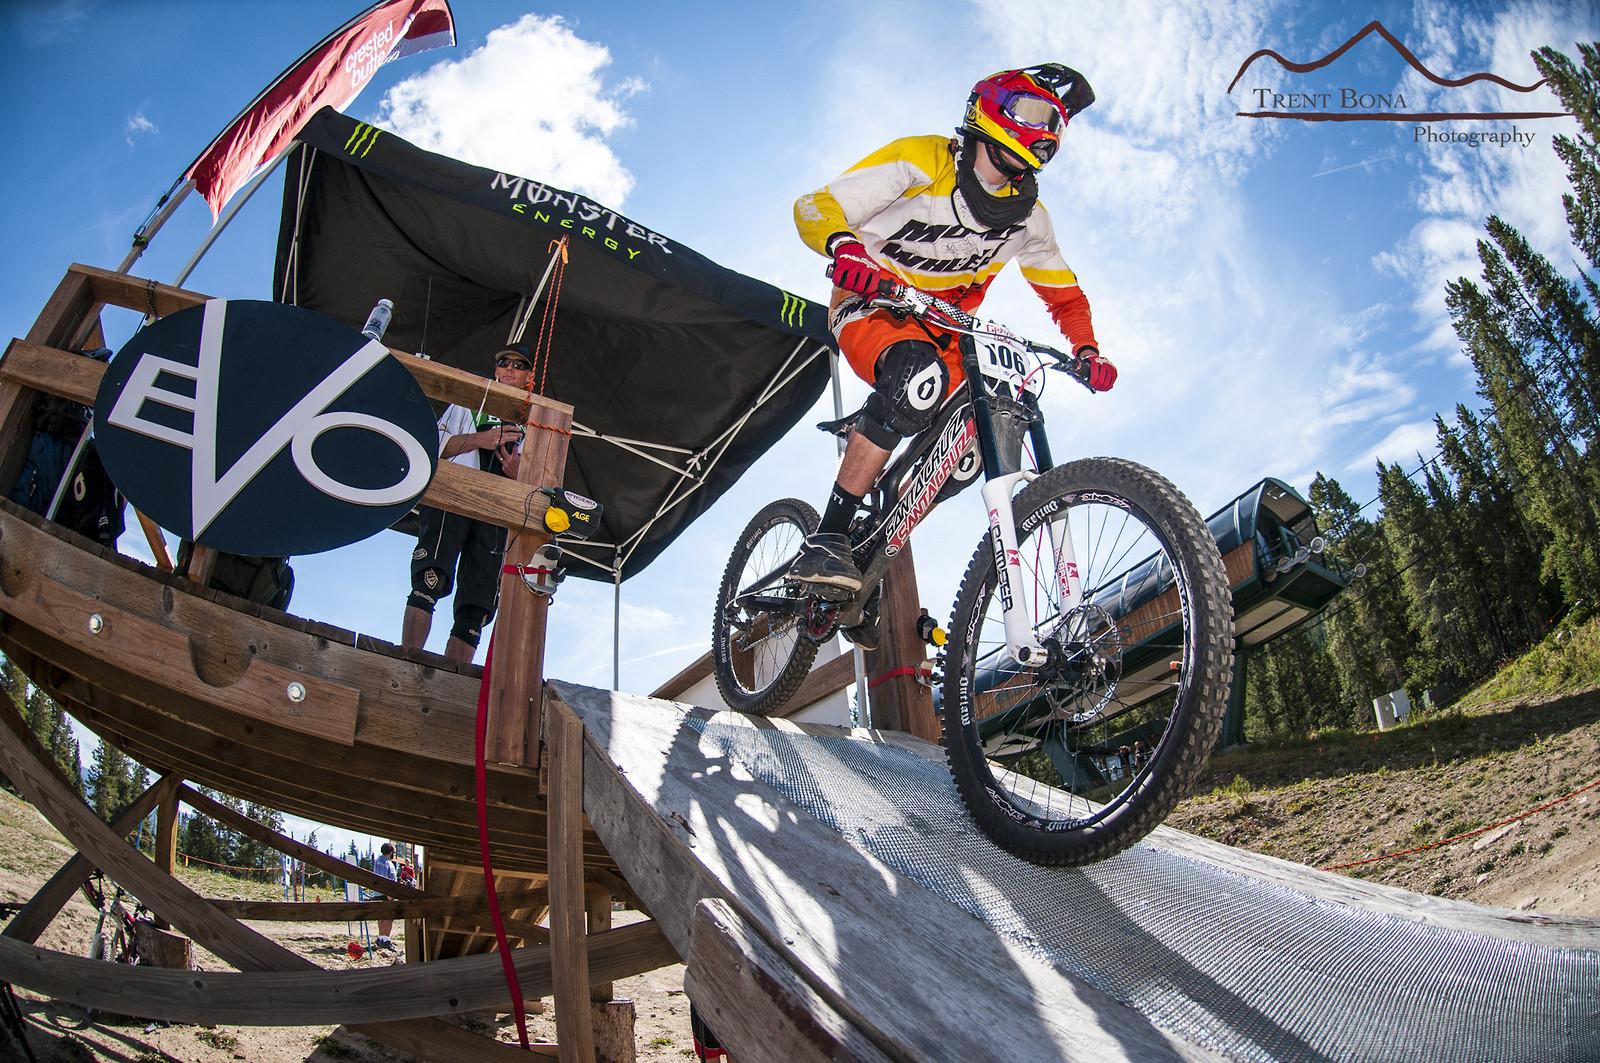 2013 Gravity Slave - Evolution Bike Park - Mountain Biking Pictures - Vital MTB